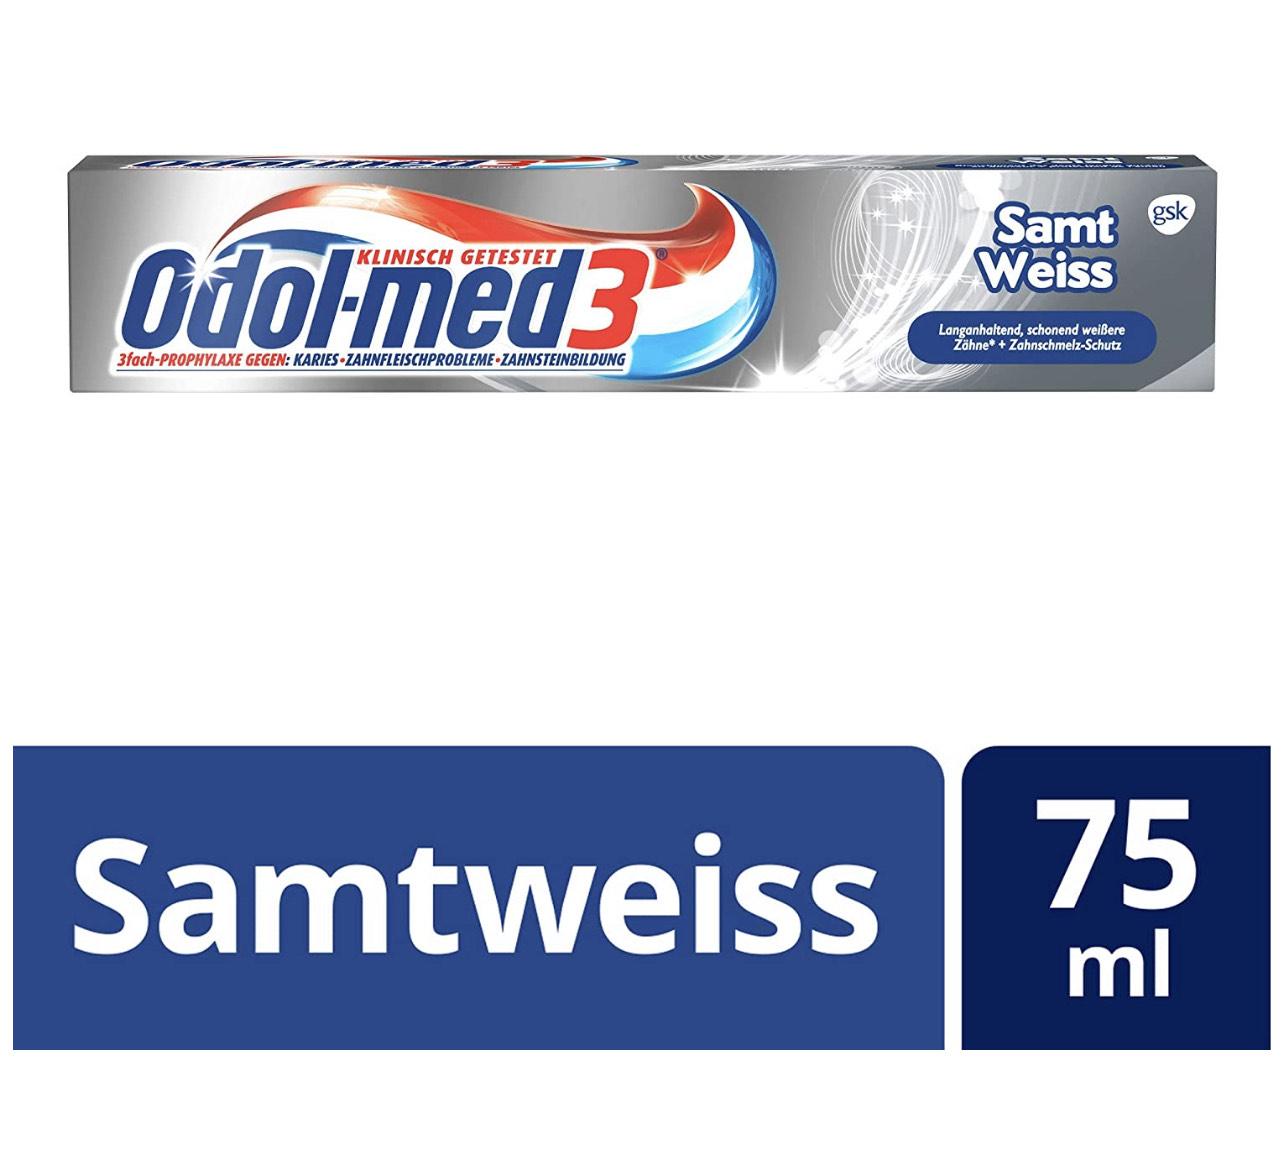 (Prime) 5x Odol-med3 Samtweiss Zahnpasta